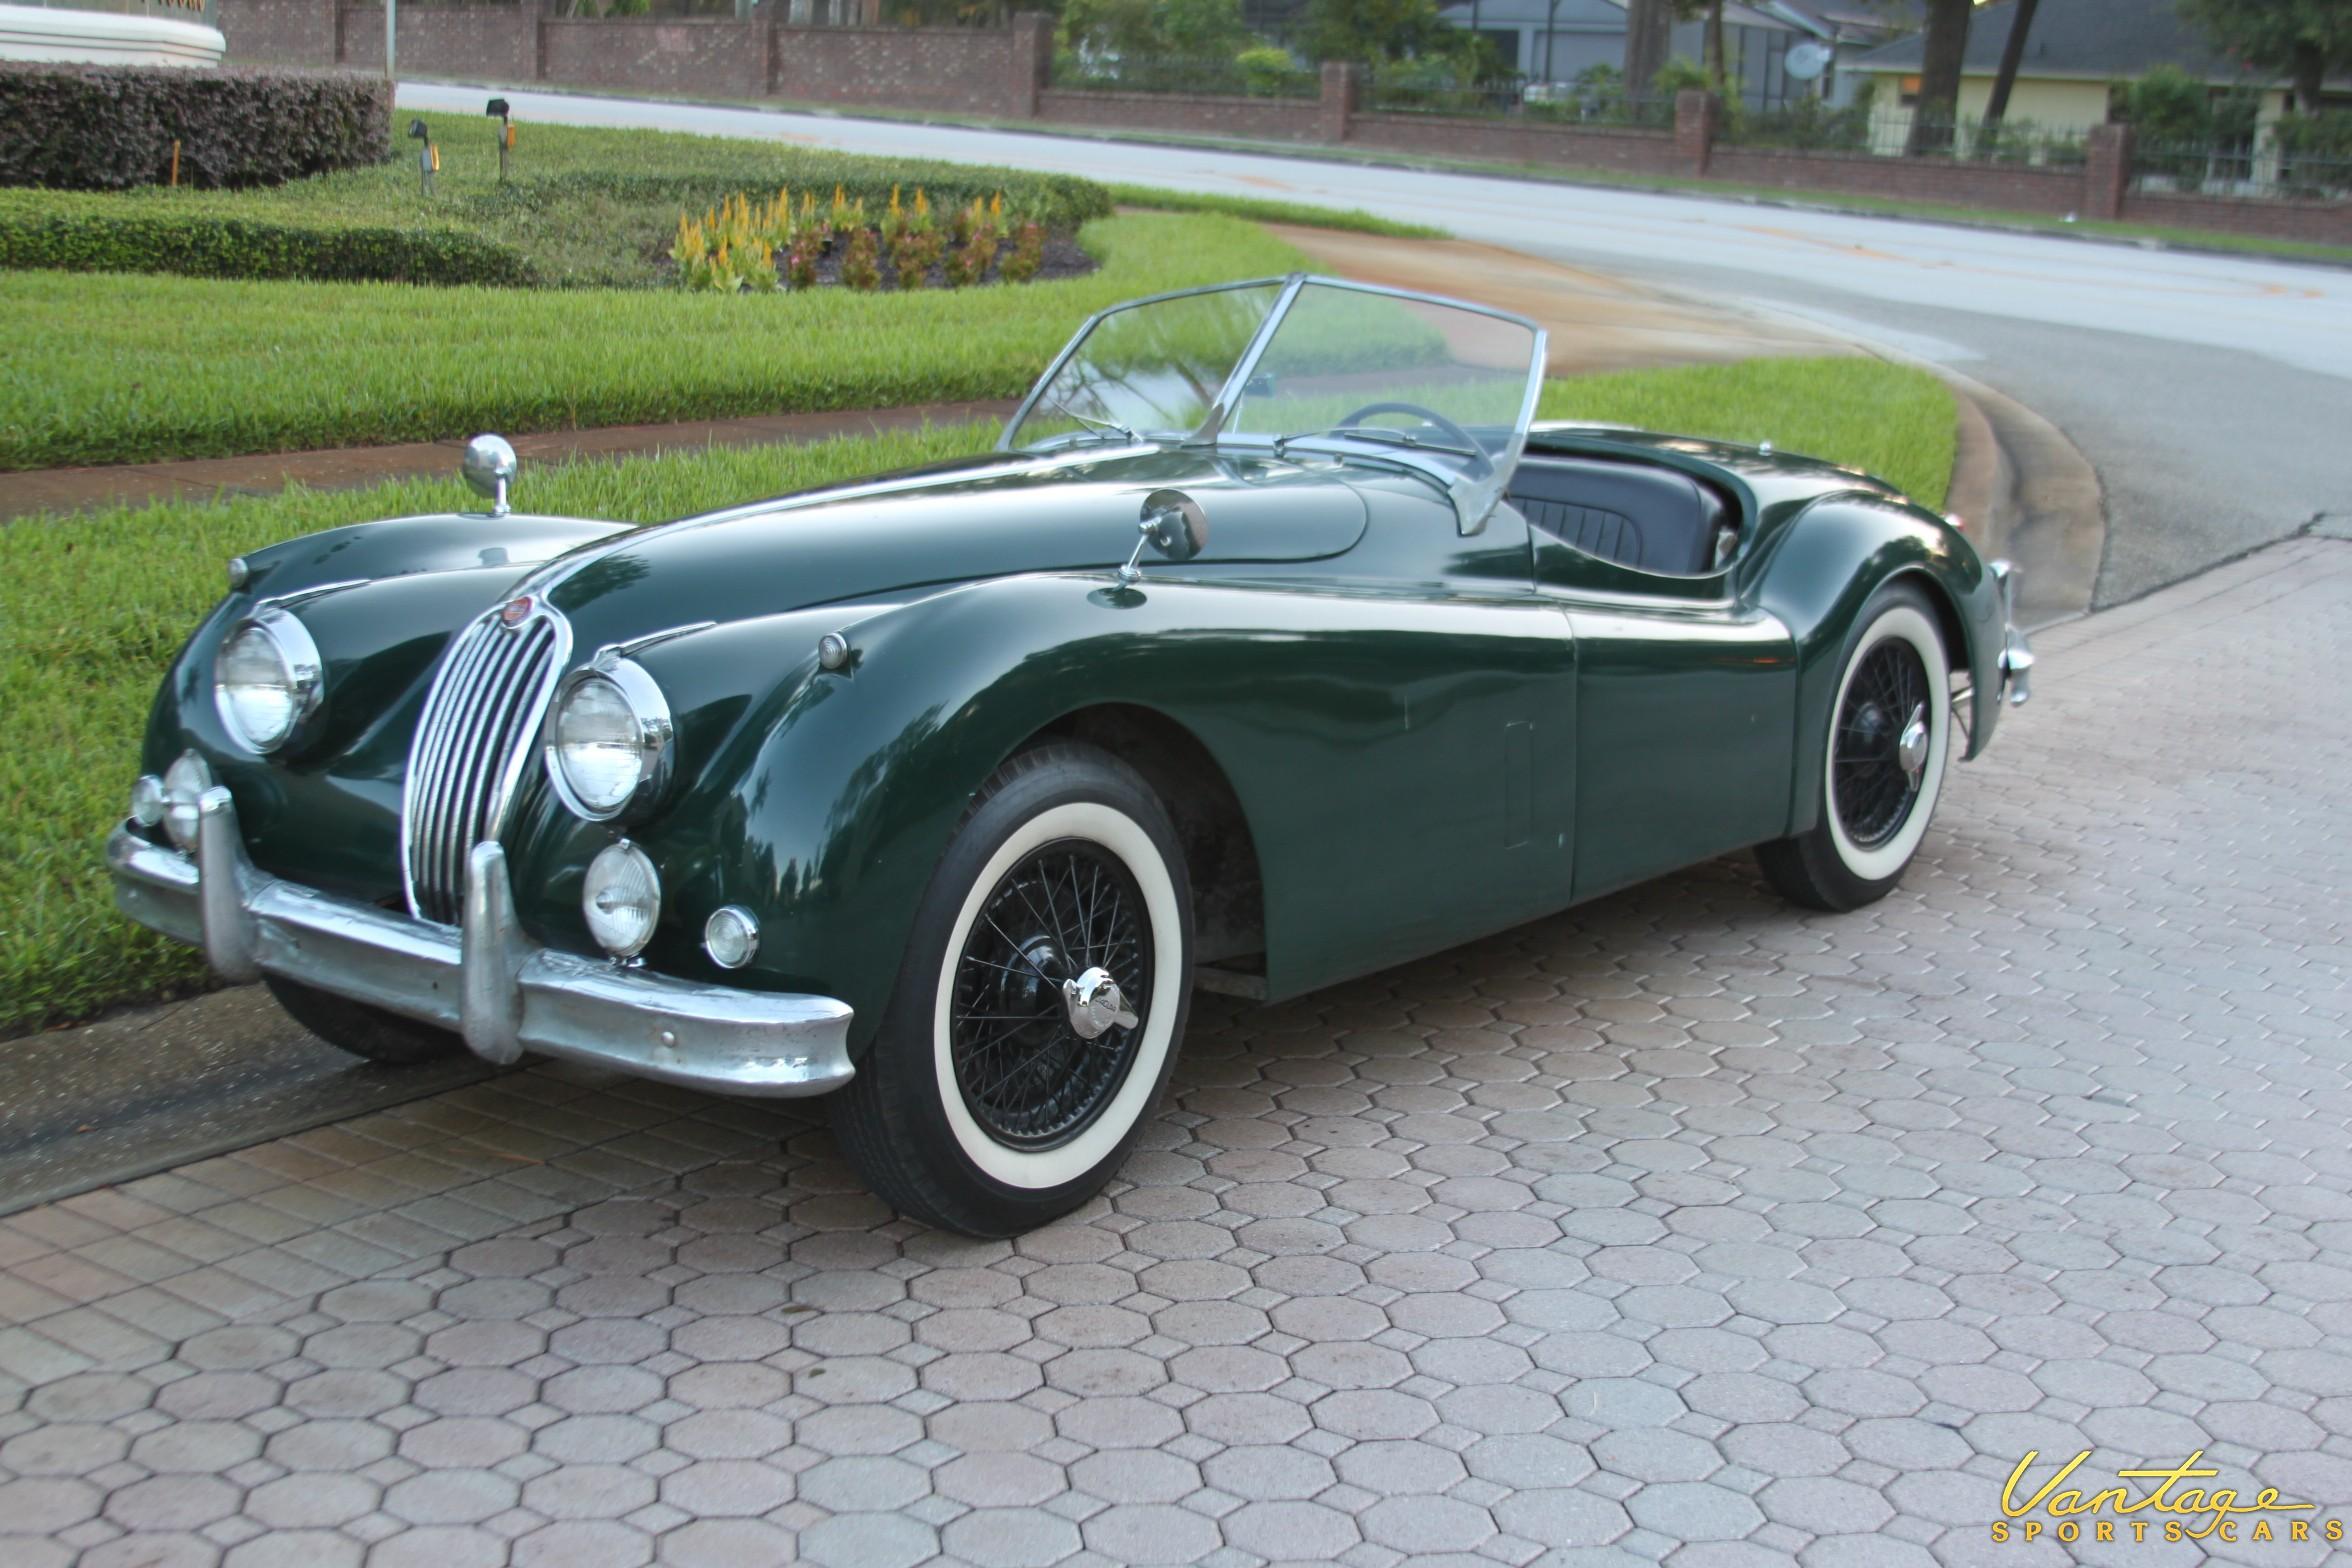 1956 Jaguar Xk140 Mc Sold Vantage Sports Cars